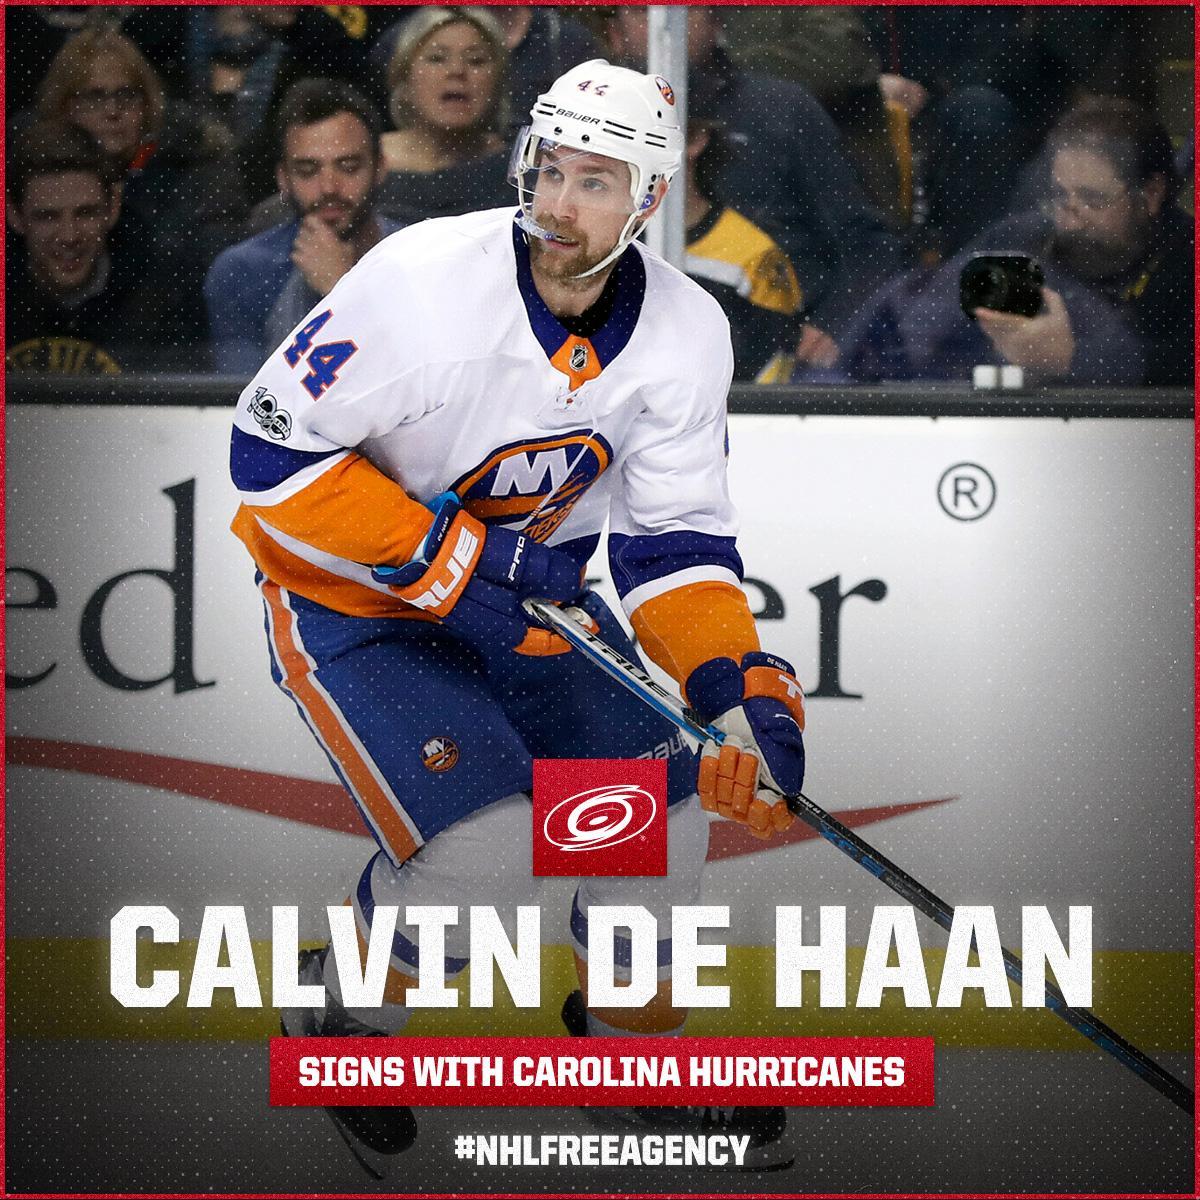 Nhl National Hockey League Carolina Hurricanes Twitter Tweet